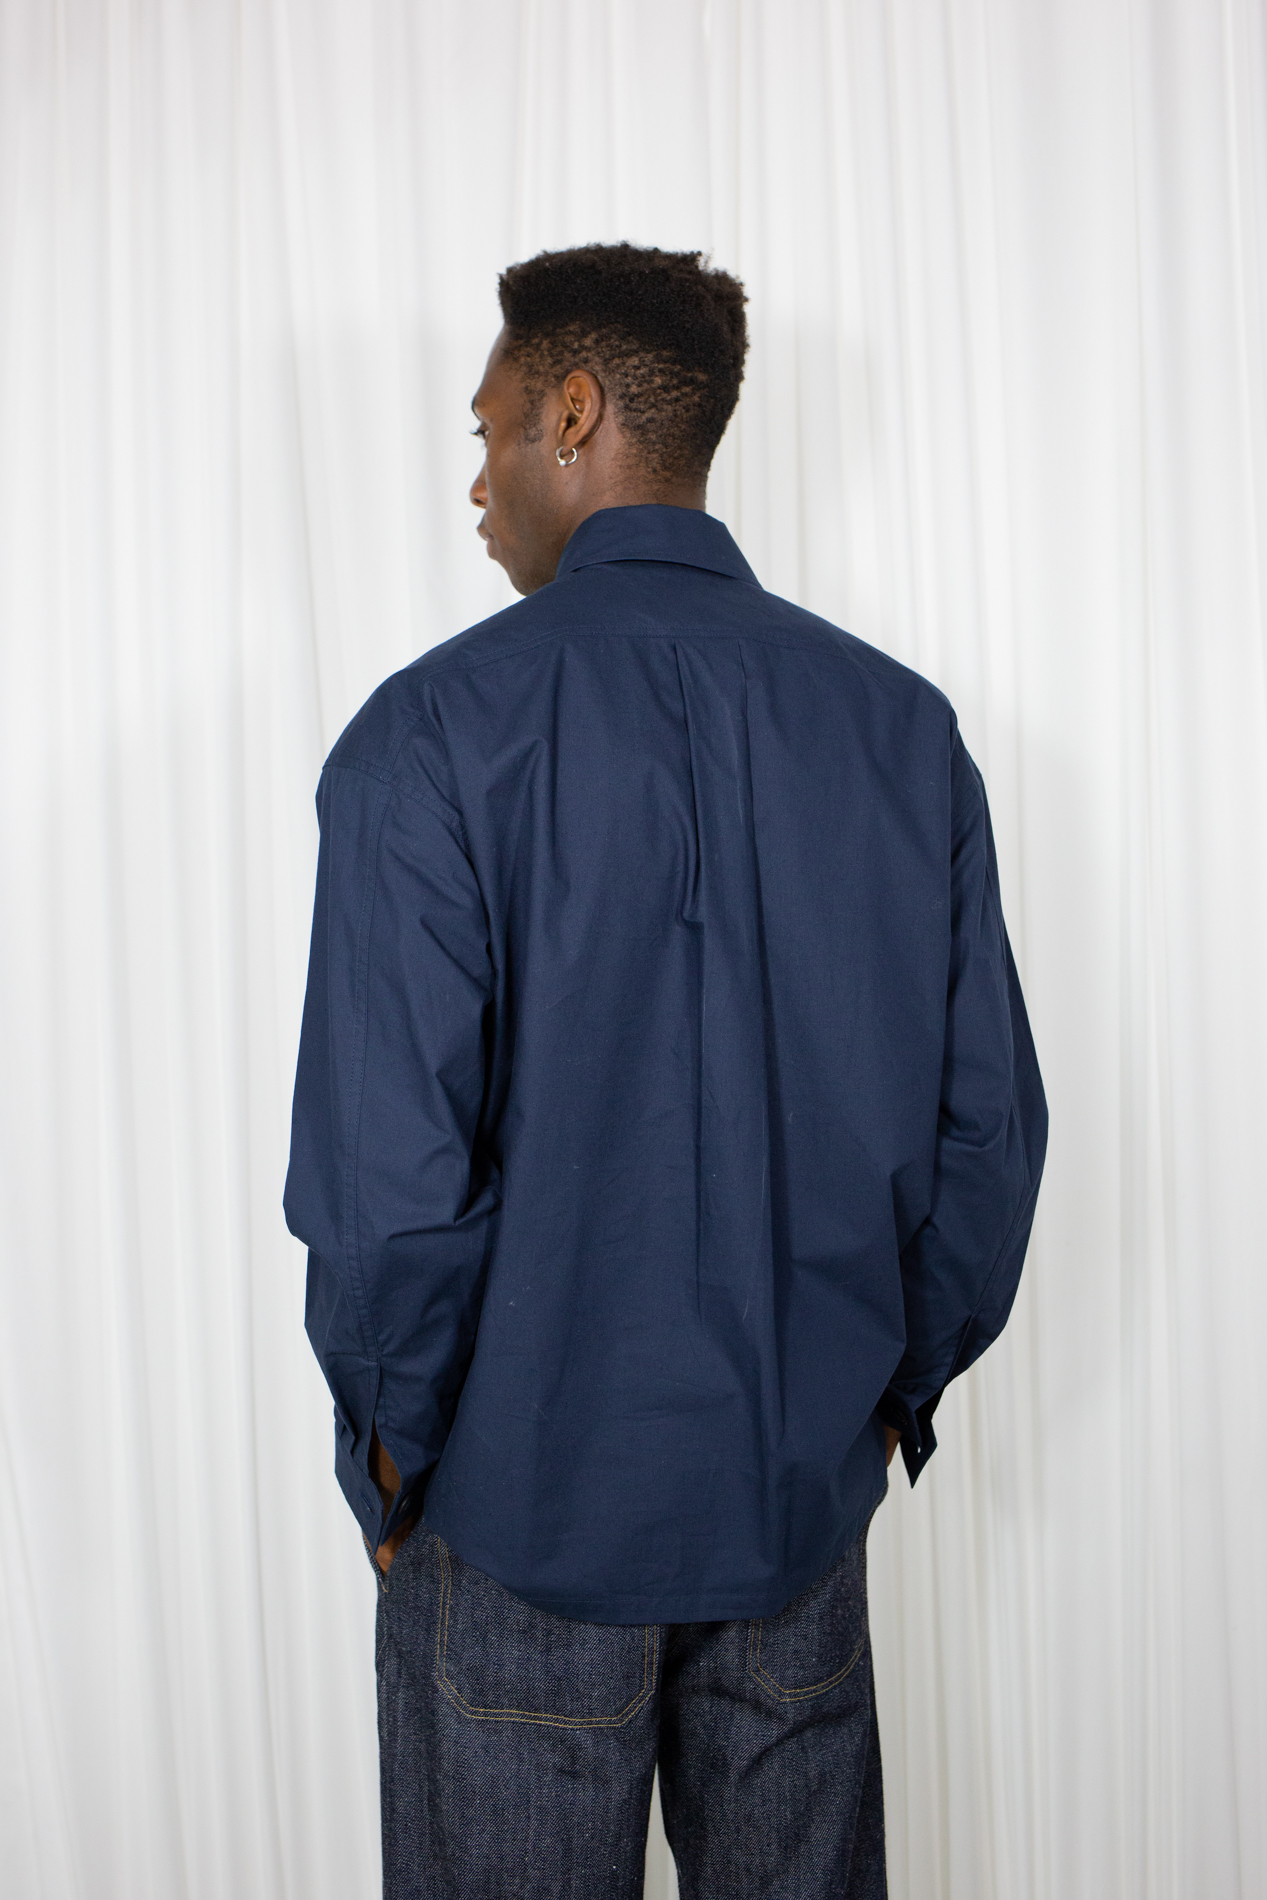 Lown Shirt Jacket